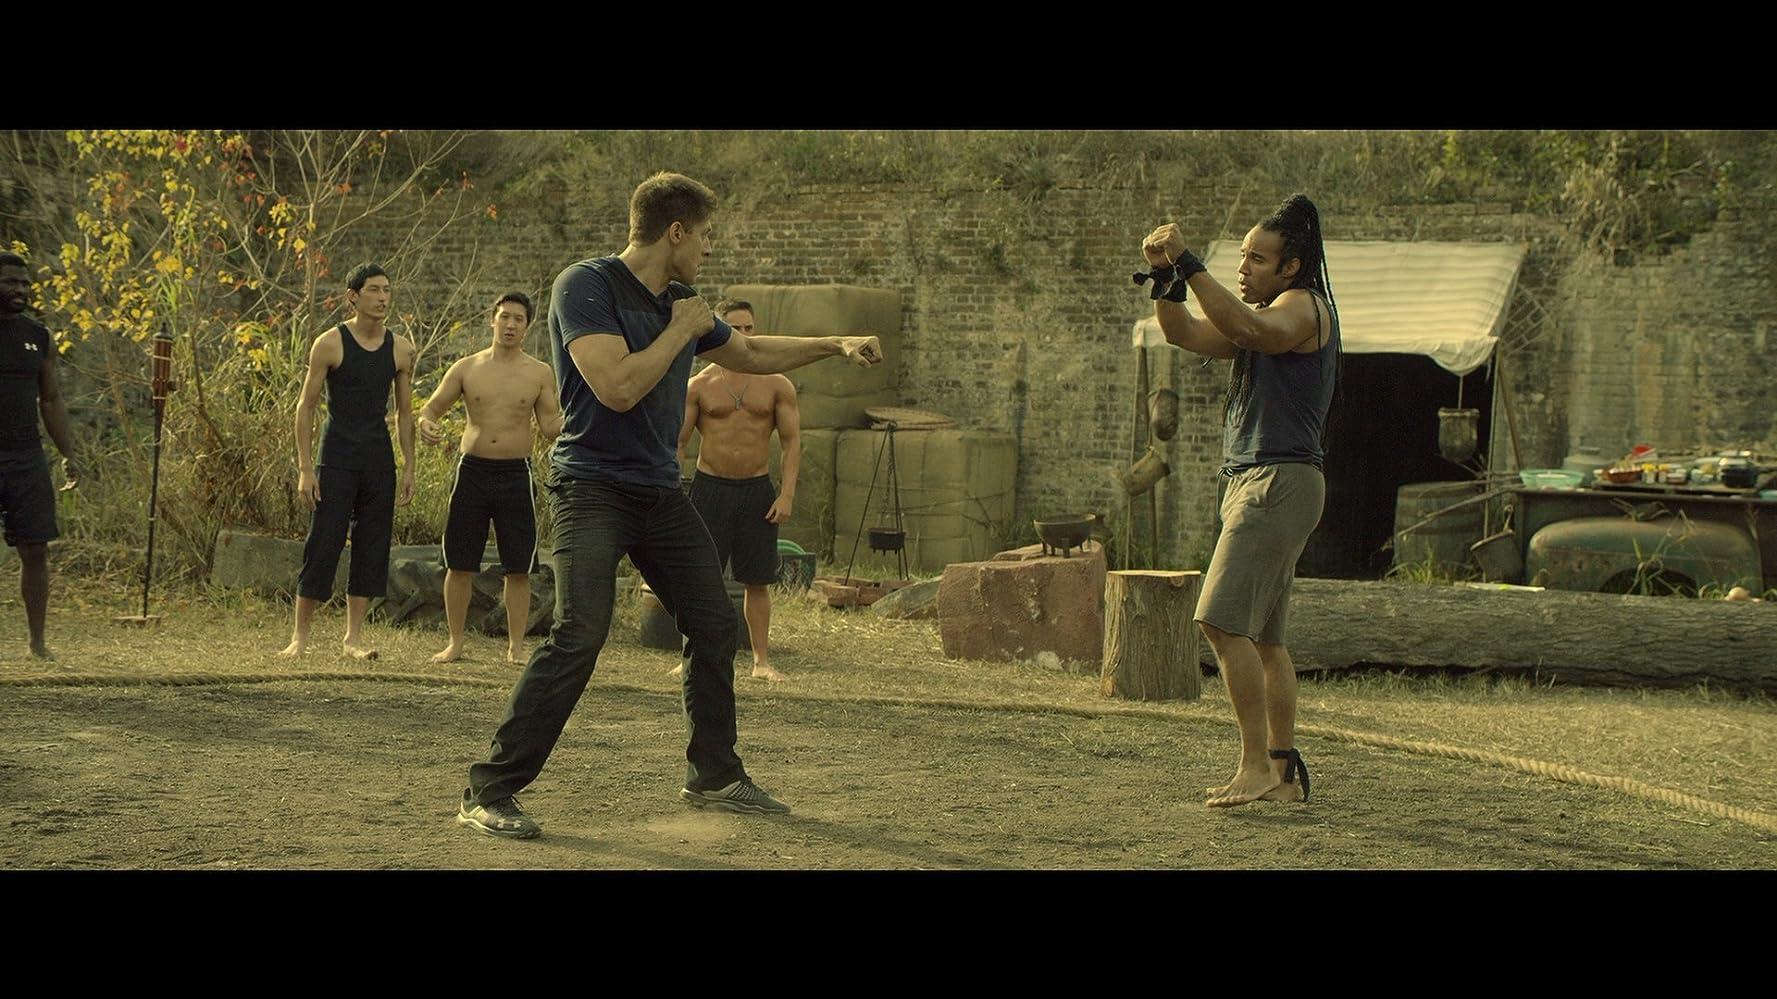 Adegan film Kickboxer: Vengeance.